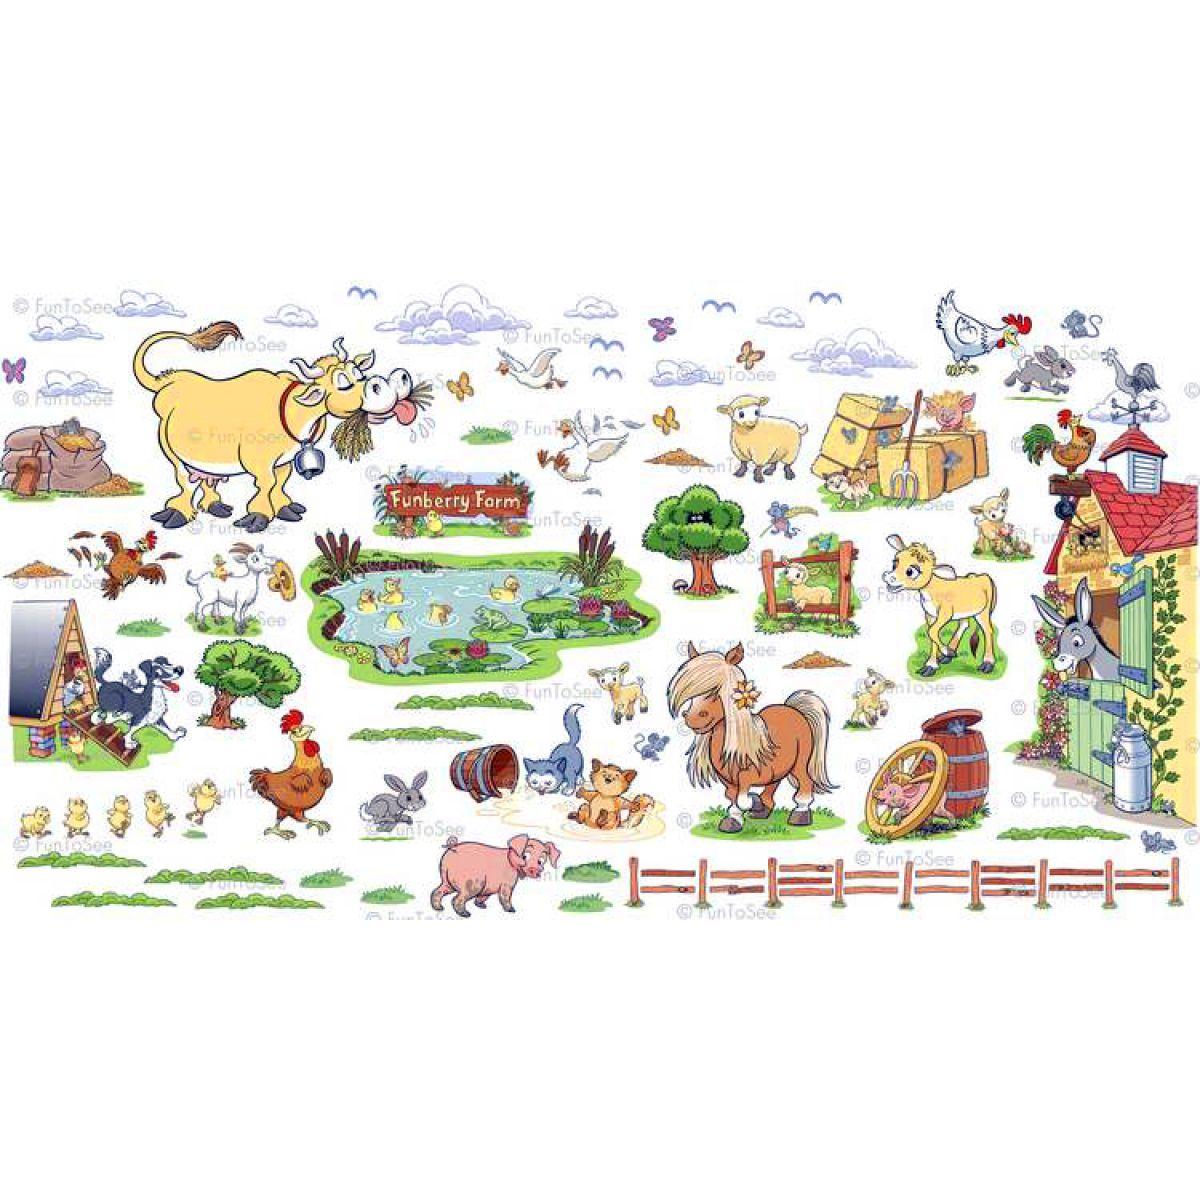 FunToSee Dekorace na zeď velké Farma